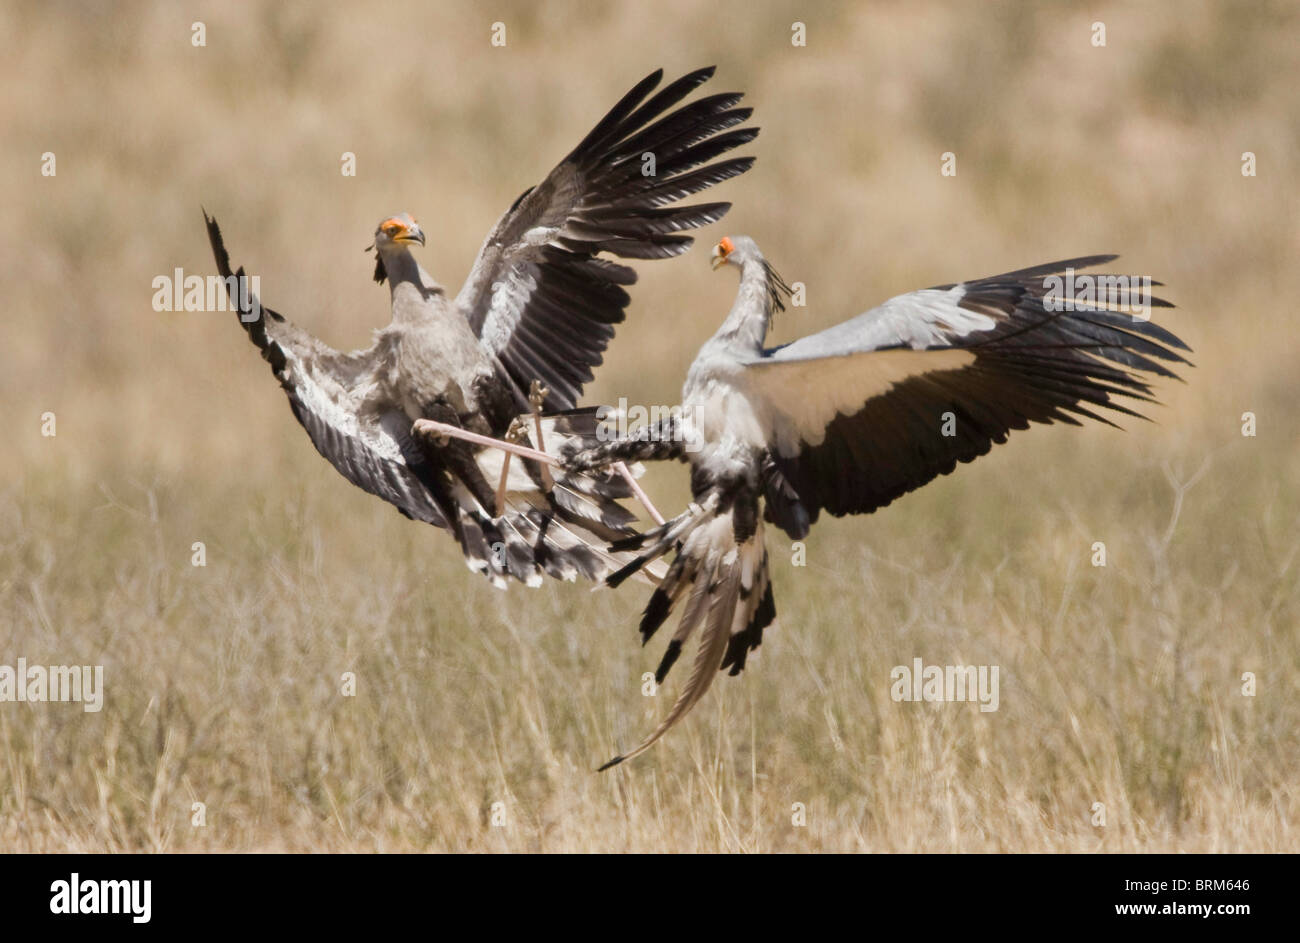 Secretary birds fighting - Stock Image